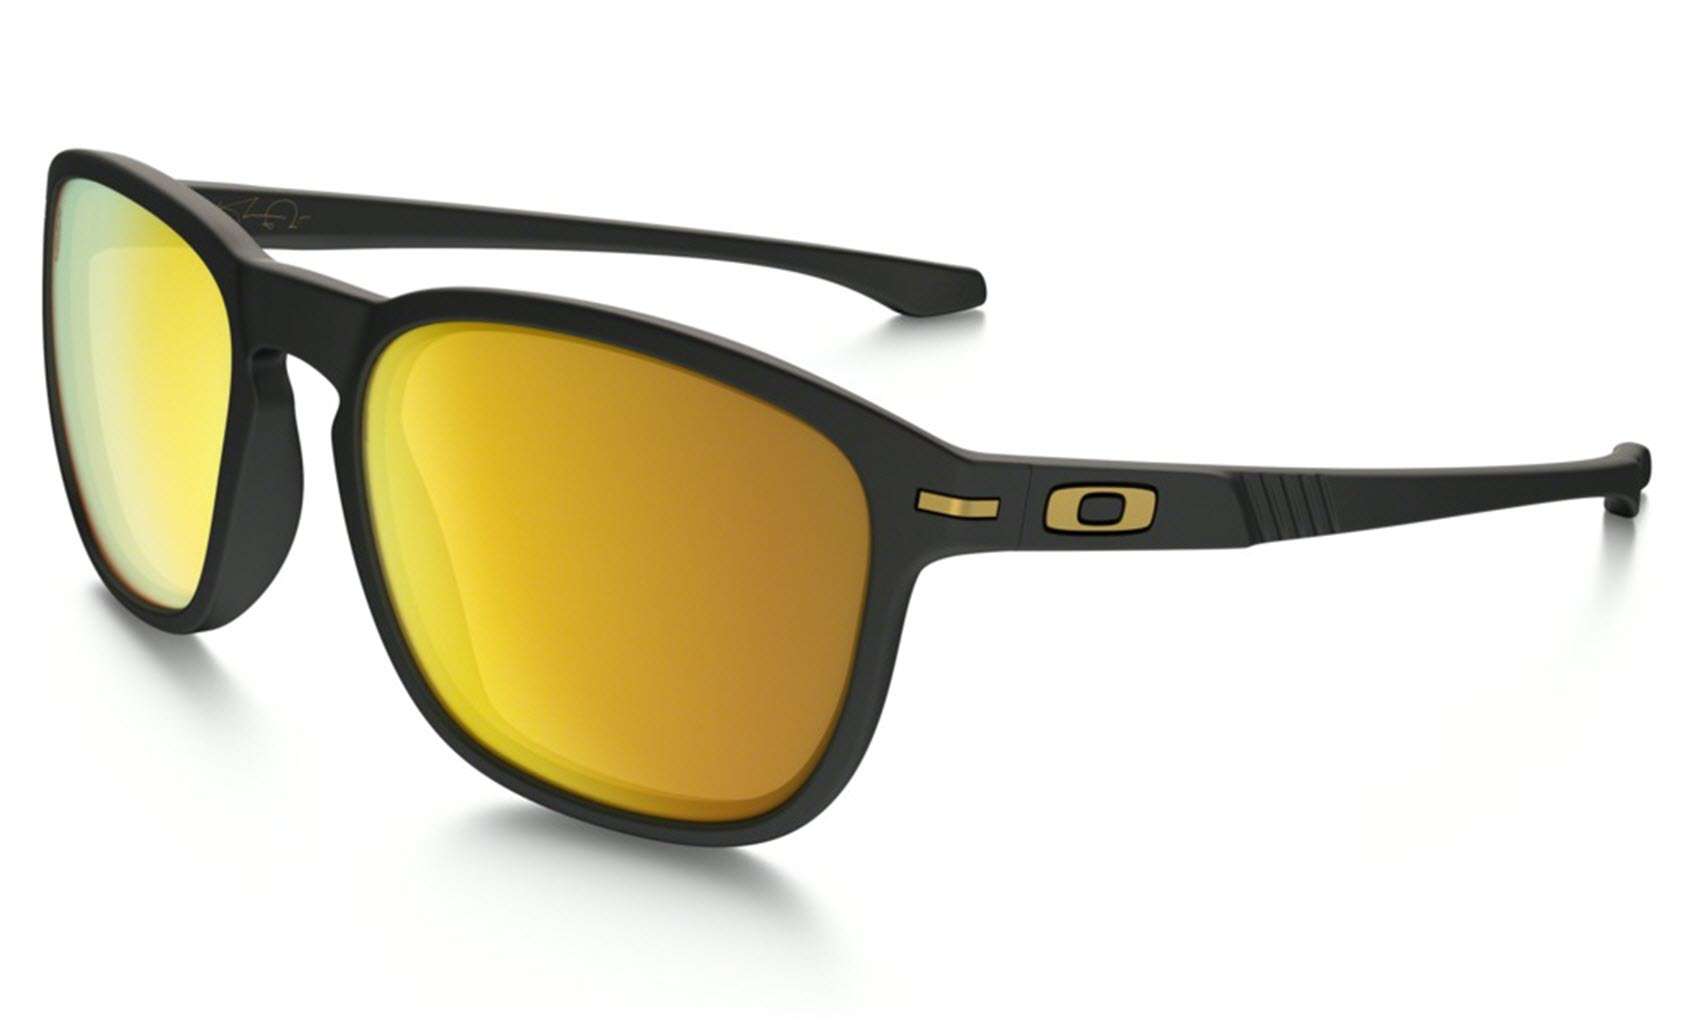 c25b7f7fc6 Oakley Enduro Sunglasses SW Collection Matte Black 24K Iridium ...